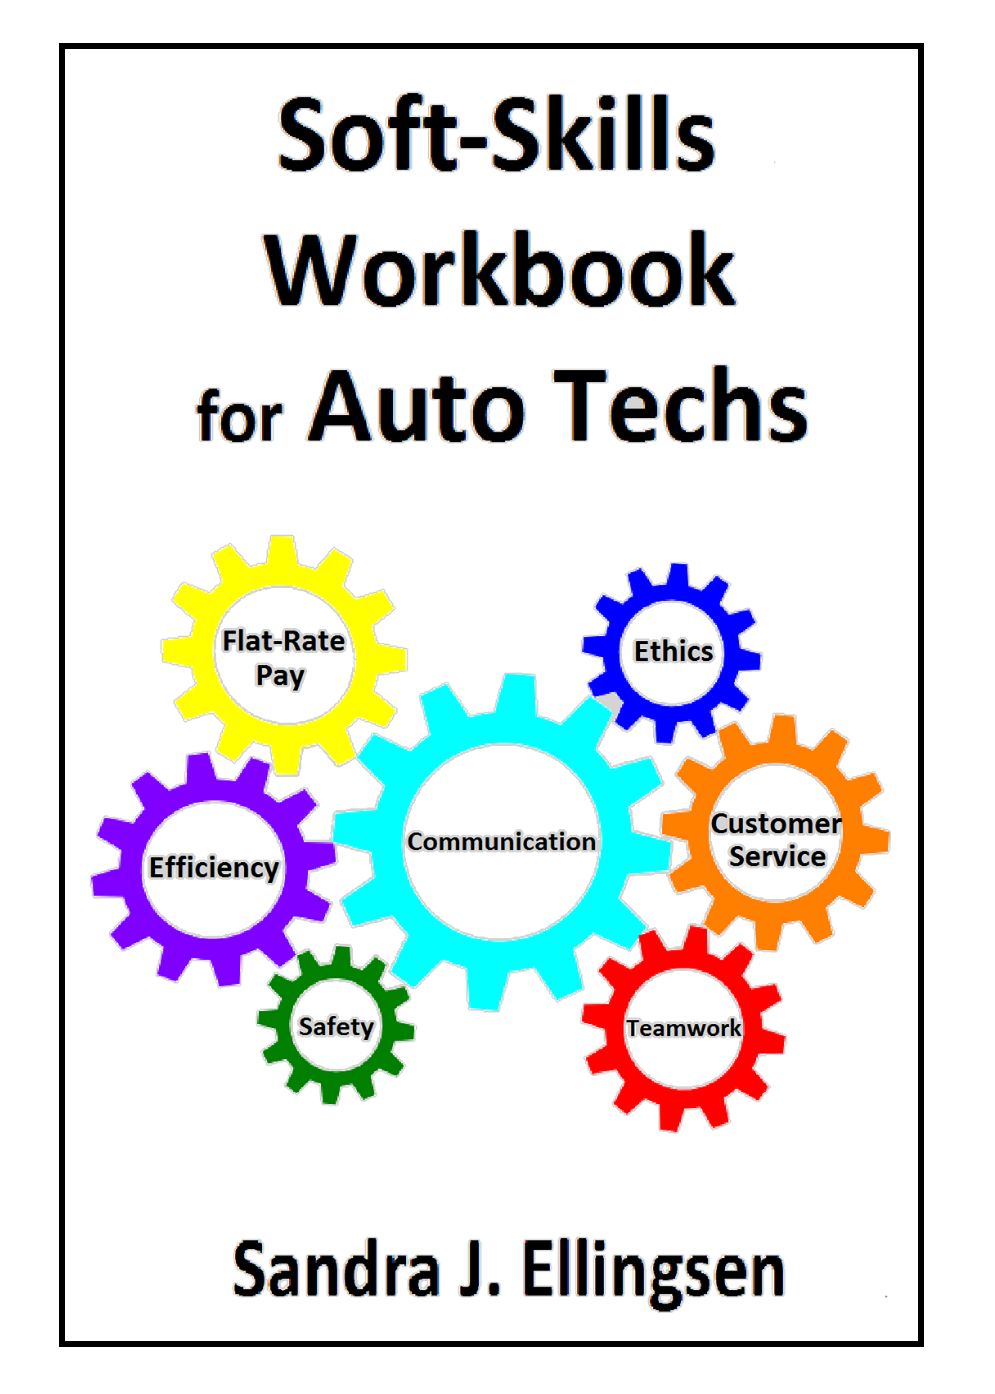 Soft-Skills Workbook for Auto Techs by Sandra J Ellingsen